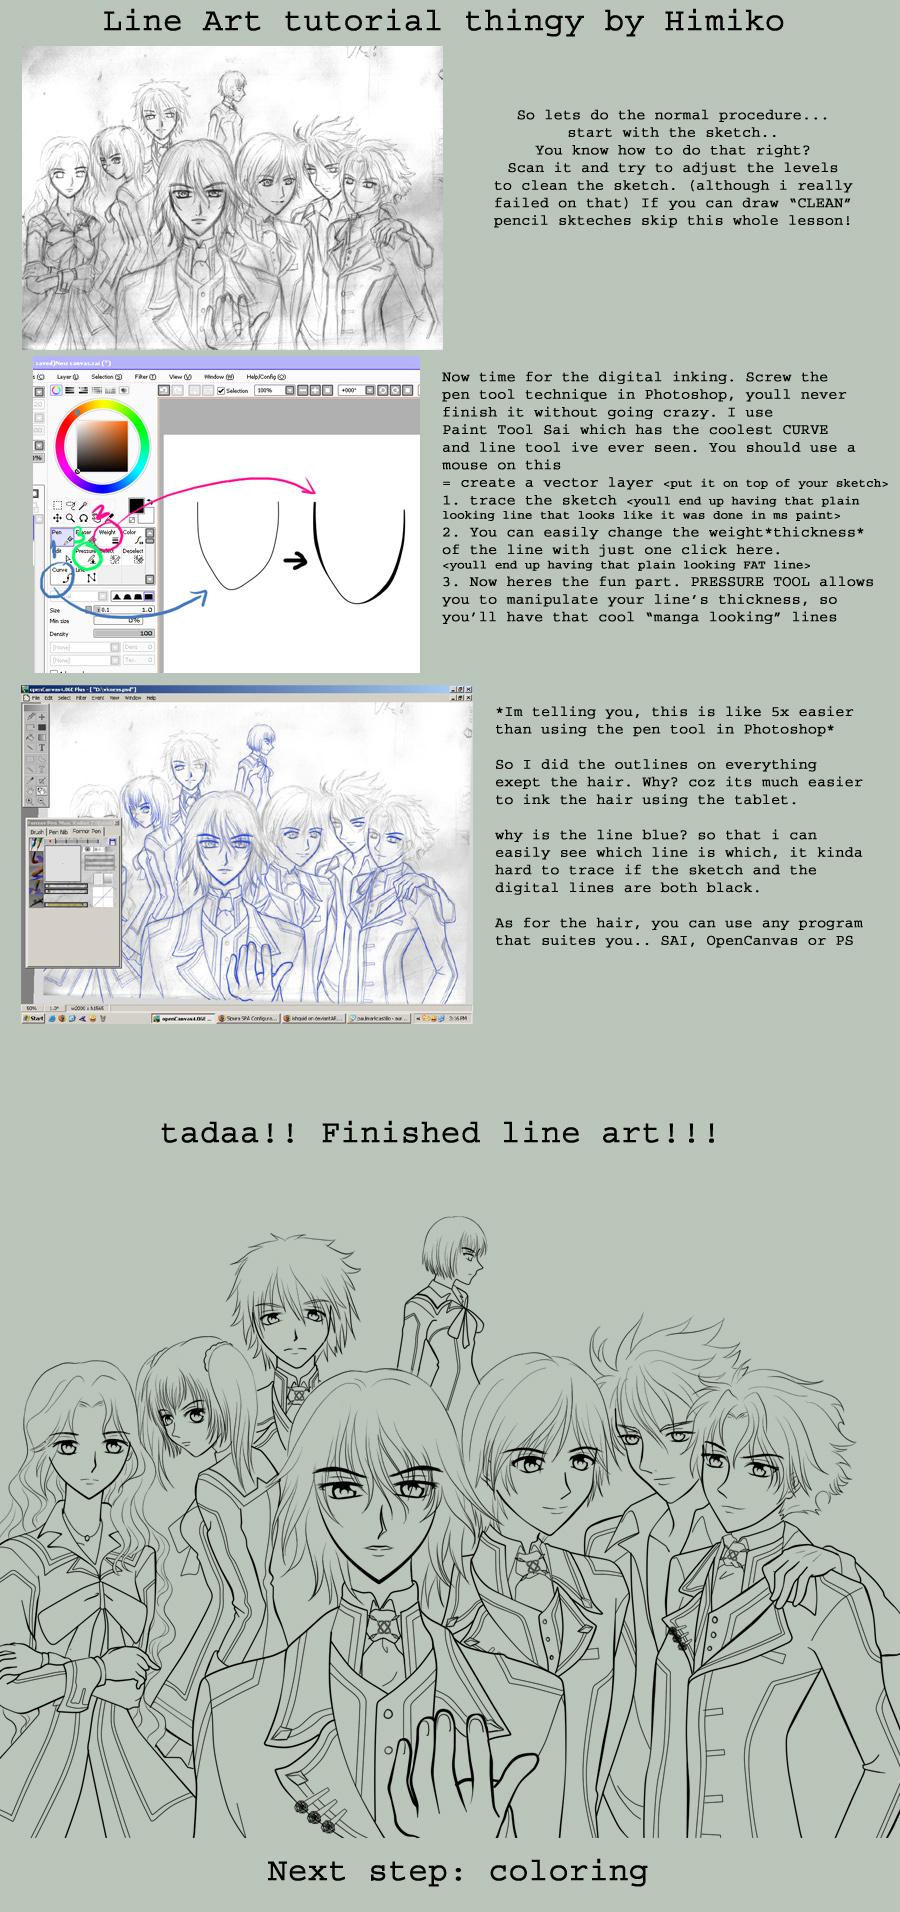 Lineart In Sai : Line art tutorial in sai by himiko on deviantart